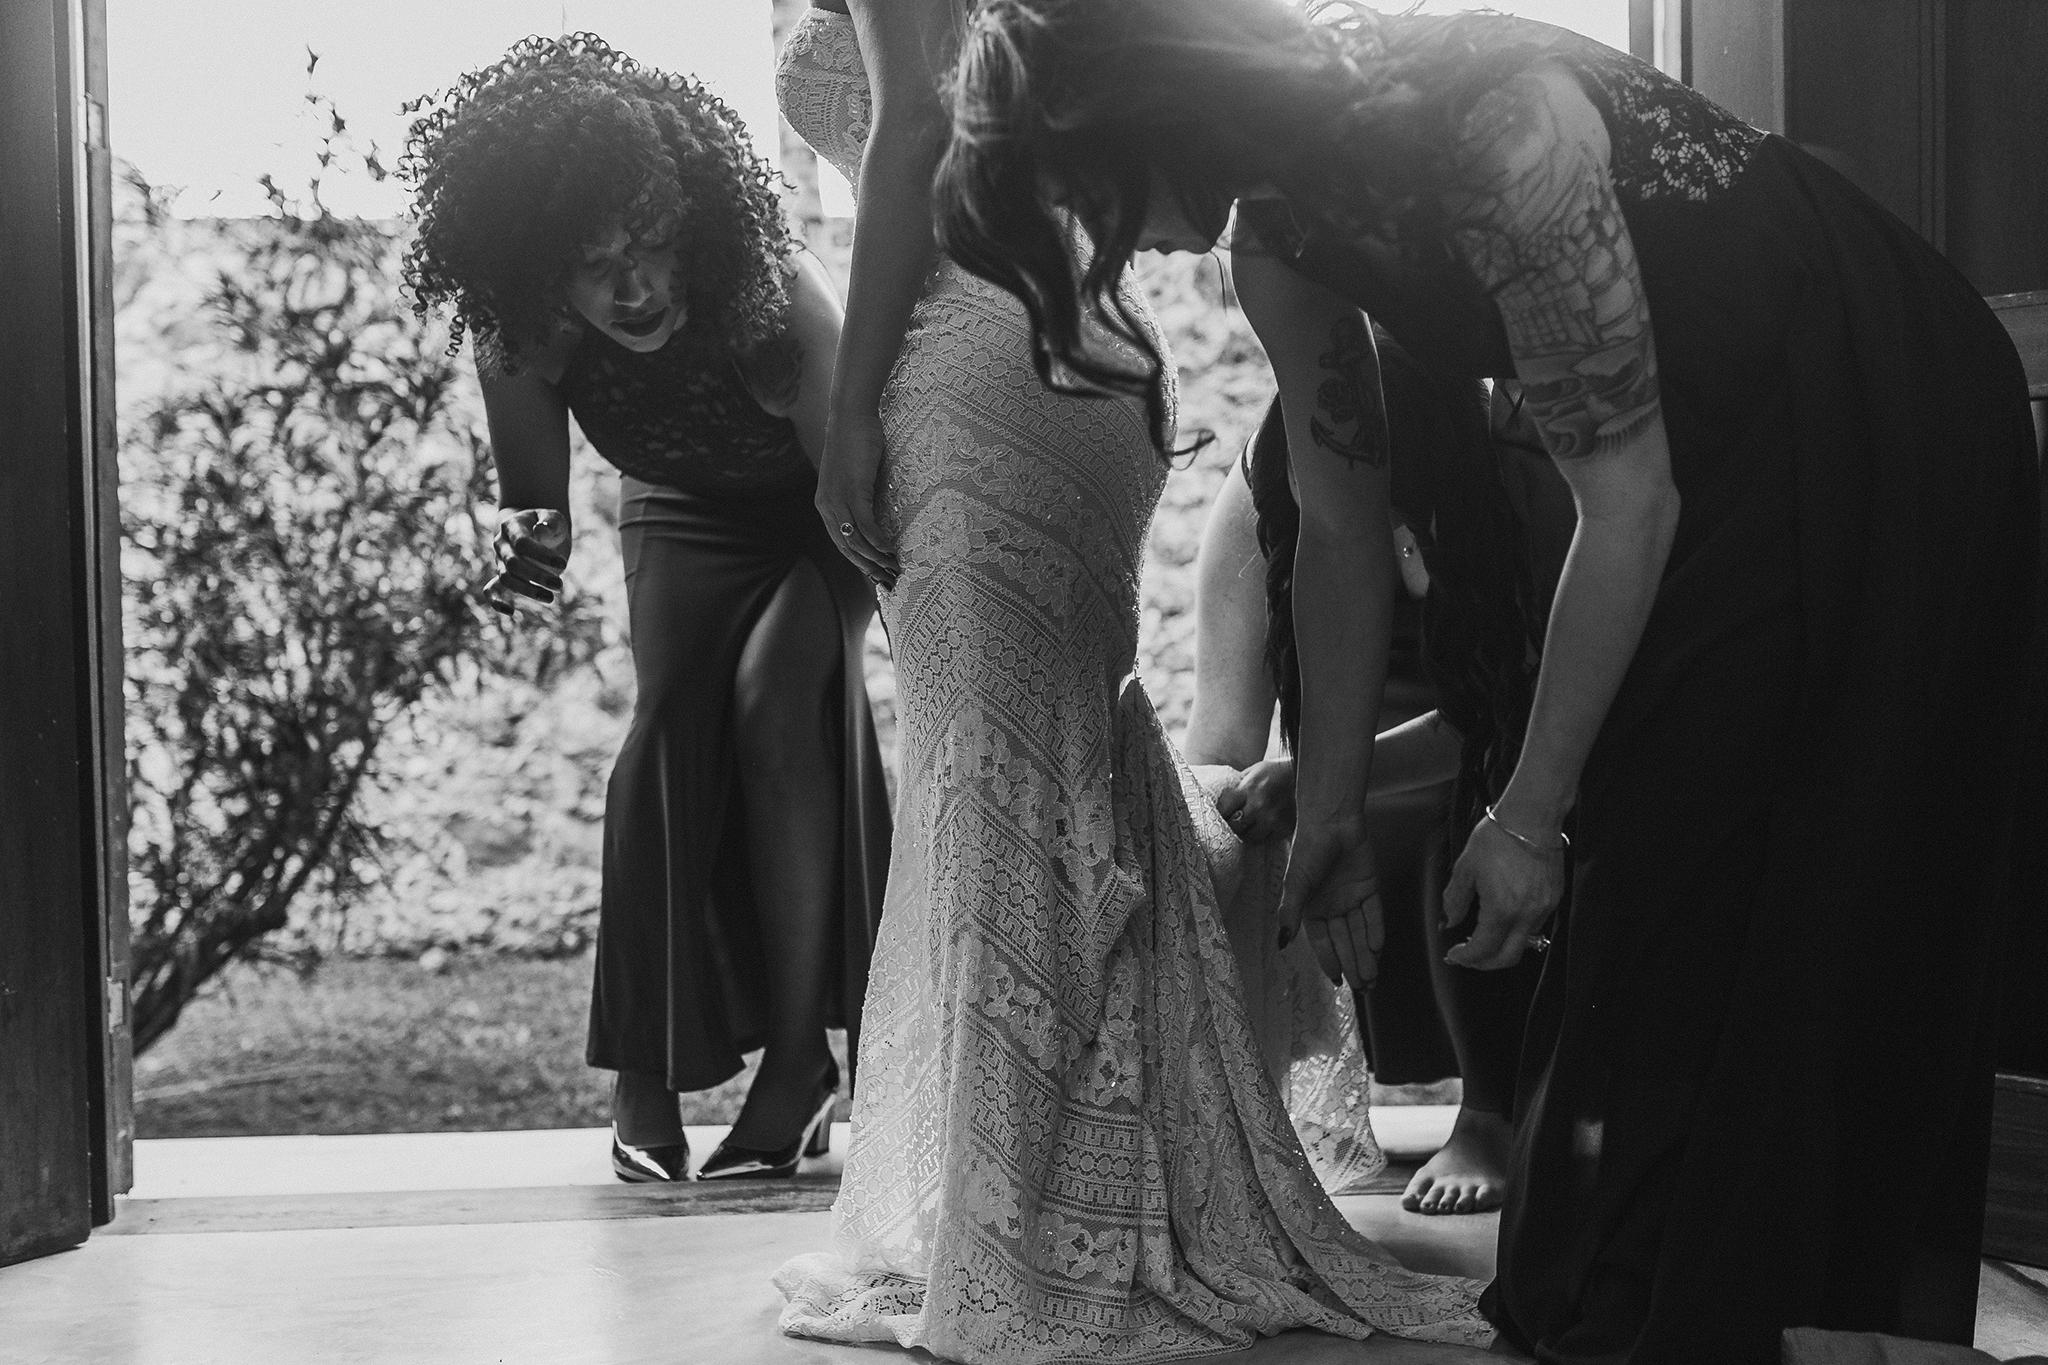 0060V&Aslide_HaciendaSacChic_WeddingGay_WeddingDstination_MeridaYucatan_HaciendasMerida_BodasMexico_BodasYucatan_Boda_Destino.jpg